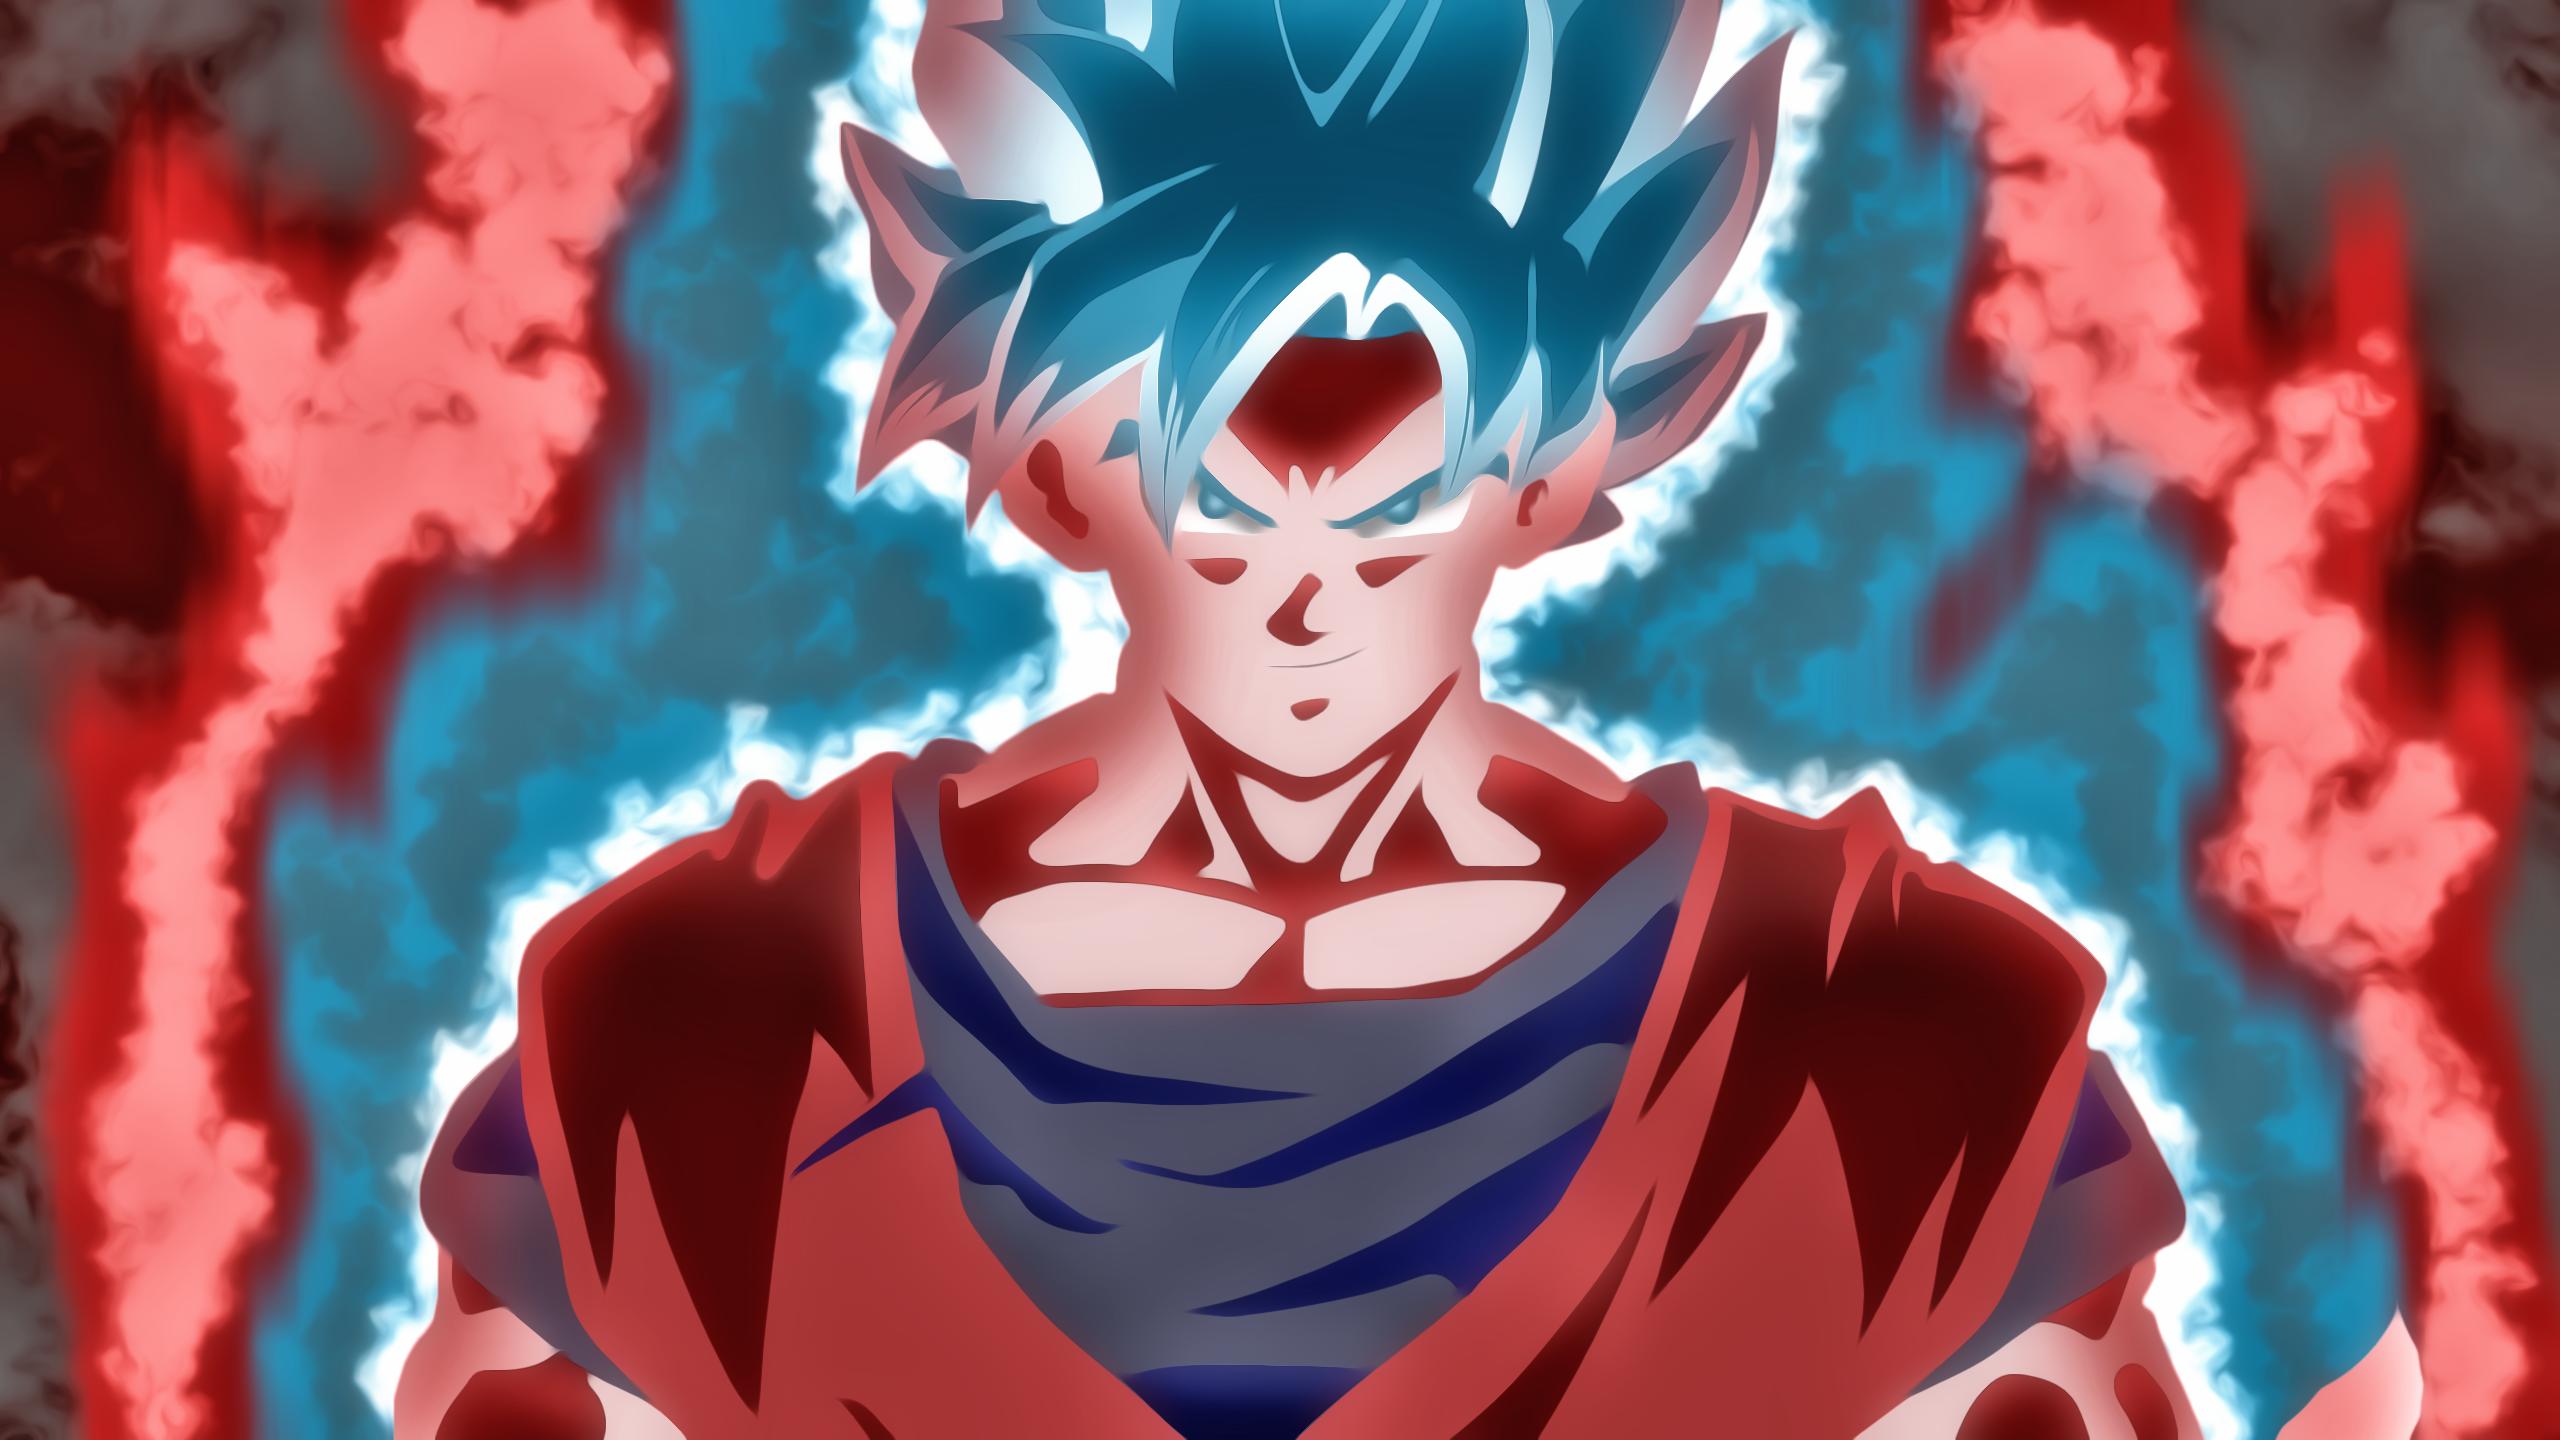 Goku Ssb Kaioken Hd Wallpaper Background Image 2560x1440 Id